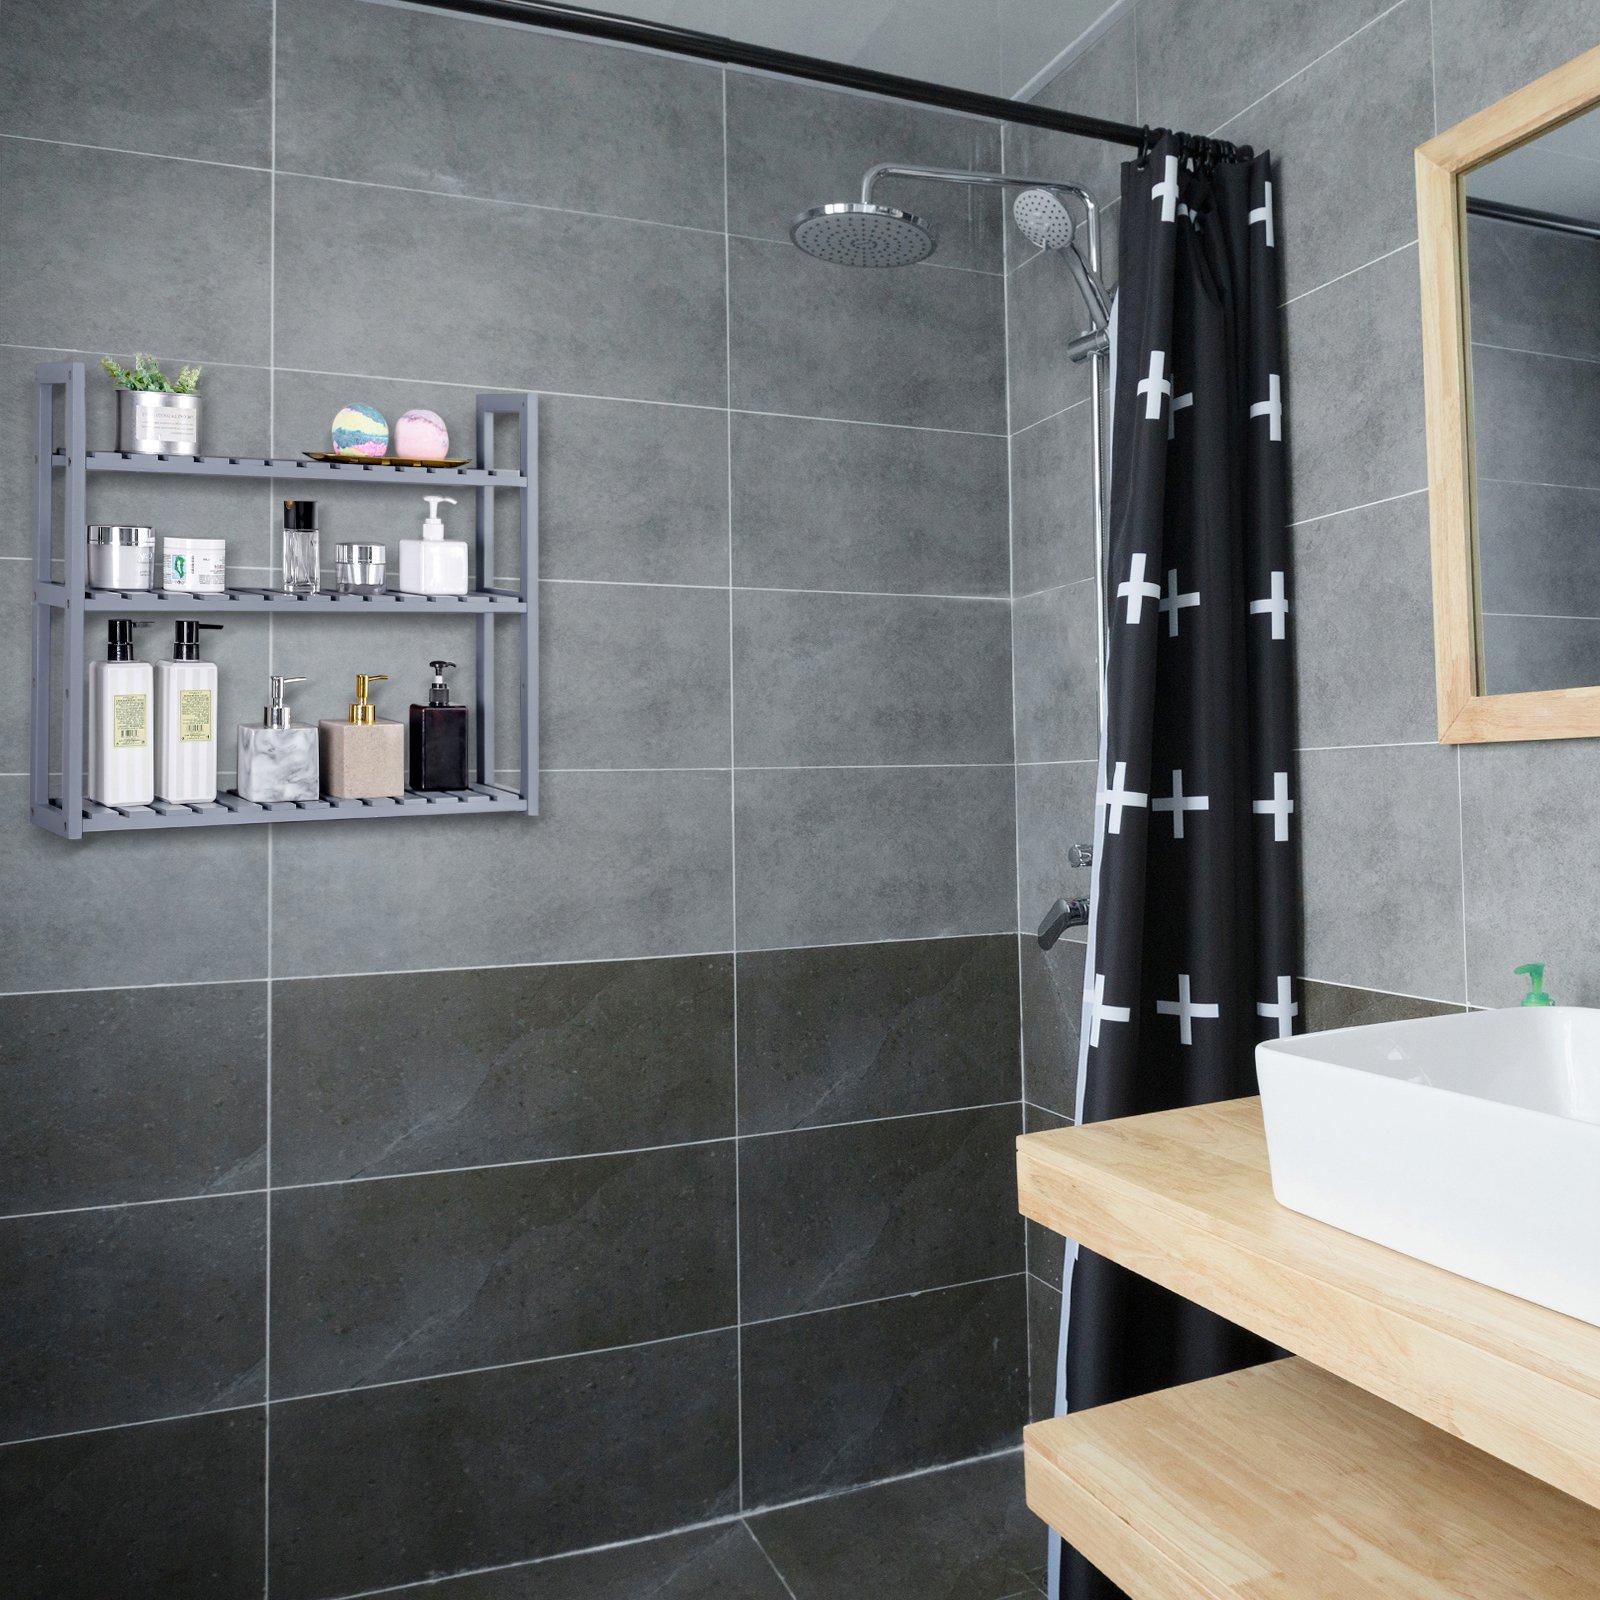 SONGMICS Wall Mounted 3-Tier Utility Storage Shelf Rack Bamboo Wood Adjustable layer Bathroom Towel Shelf Multifunctional Kitchen Living Room Holder Grey UBCB13GY by SONGMICS (Image #5)